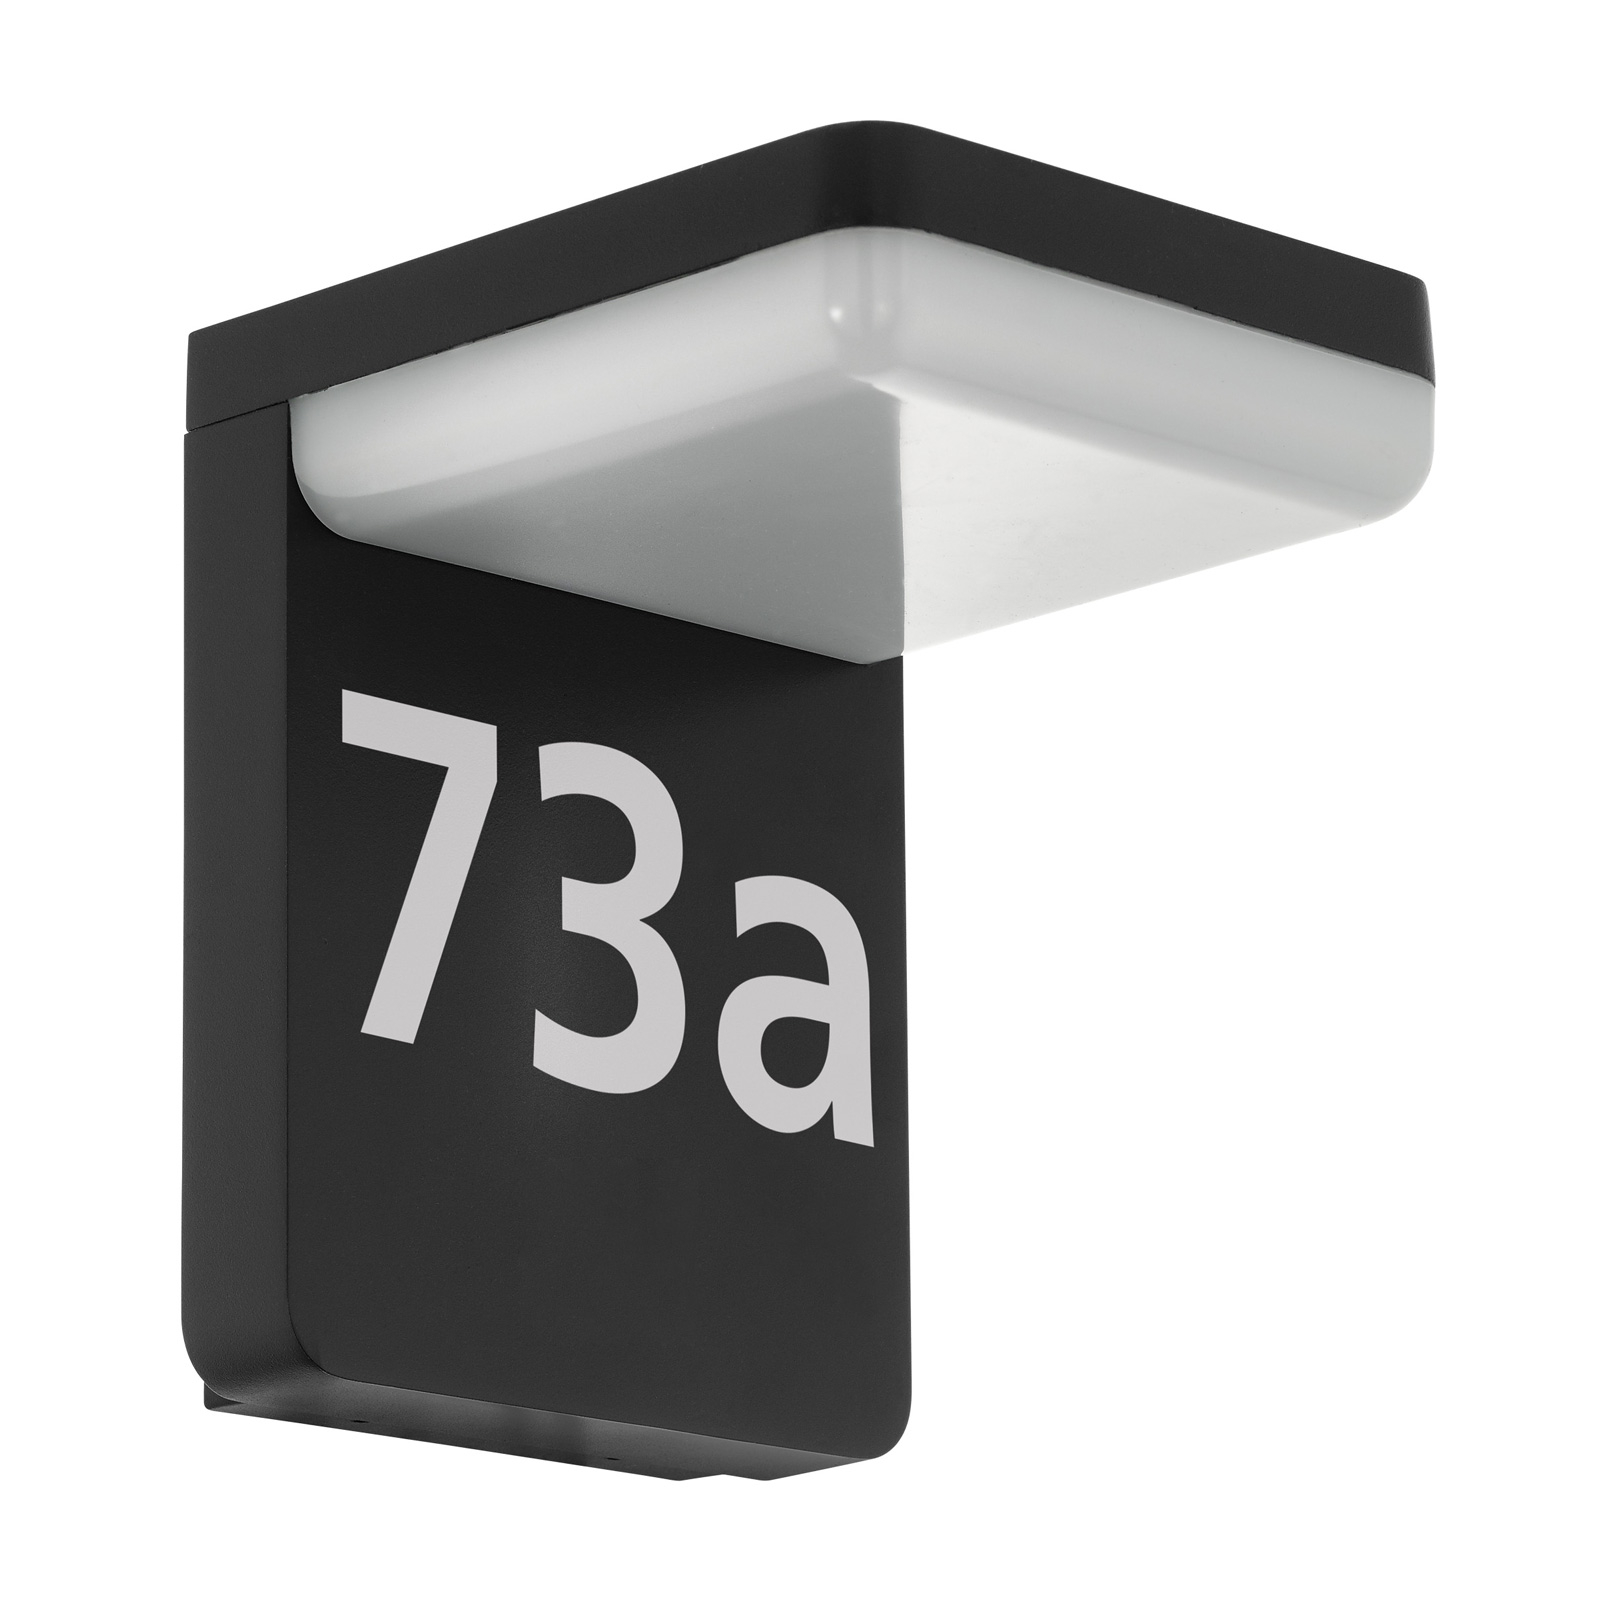 LED-Hausnummernleuchte Amarosi